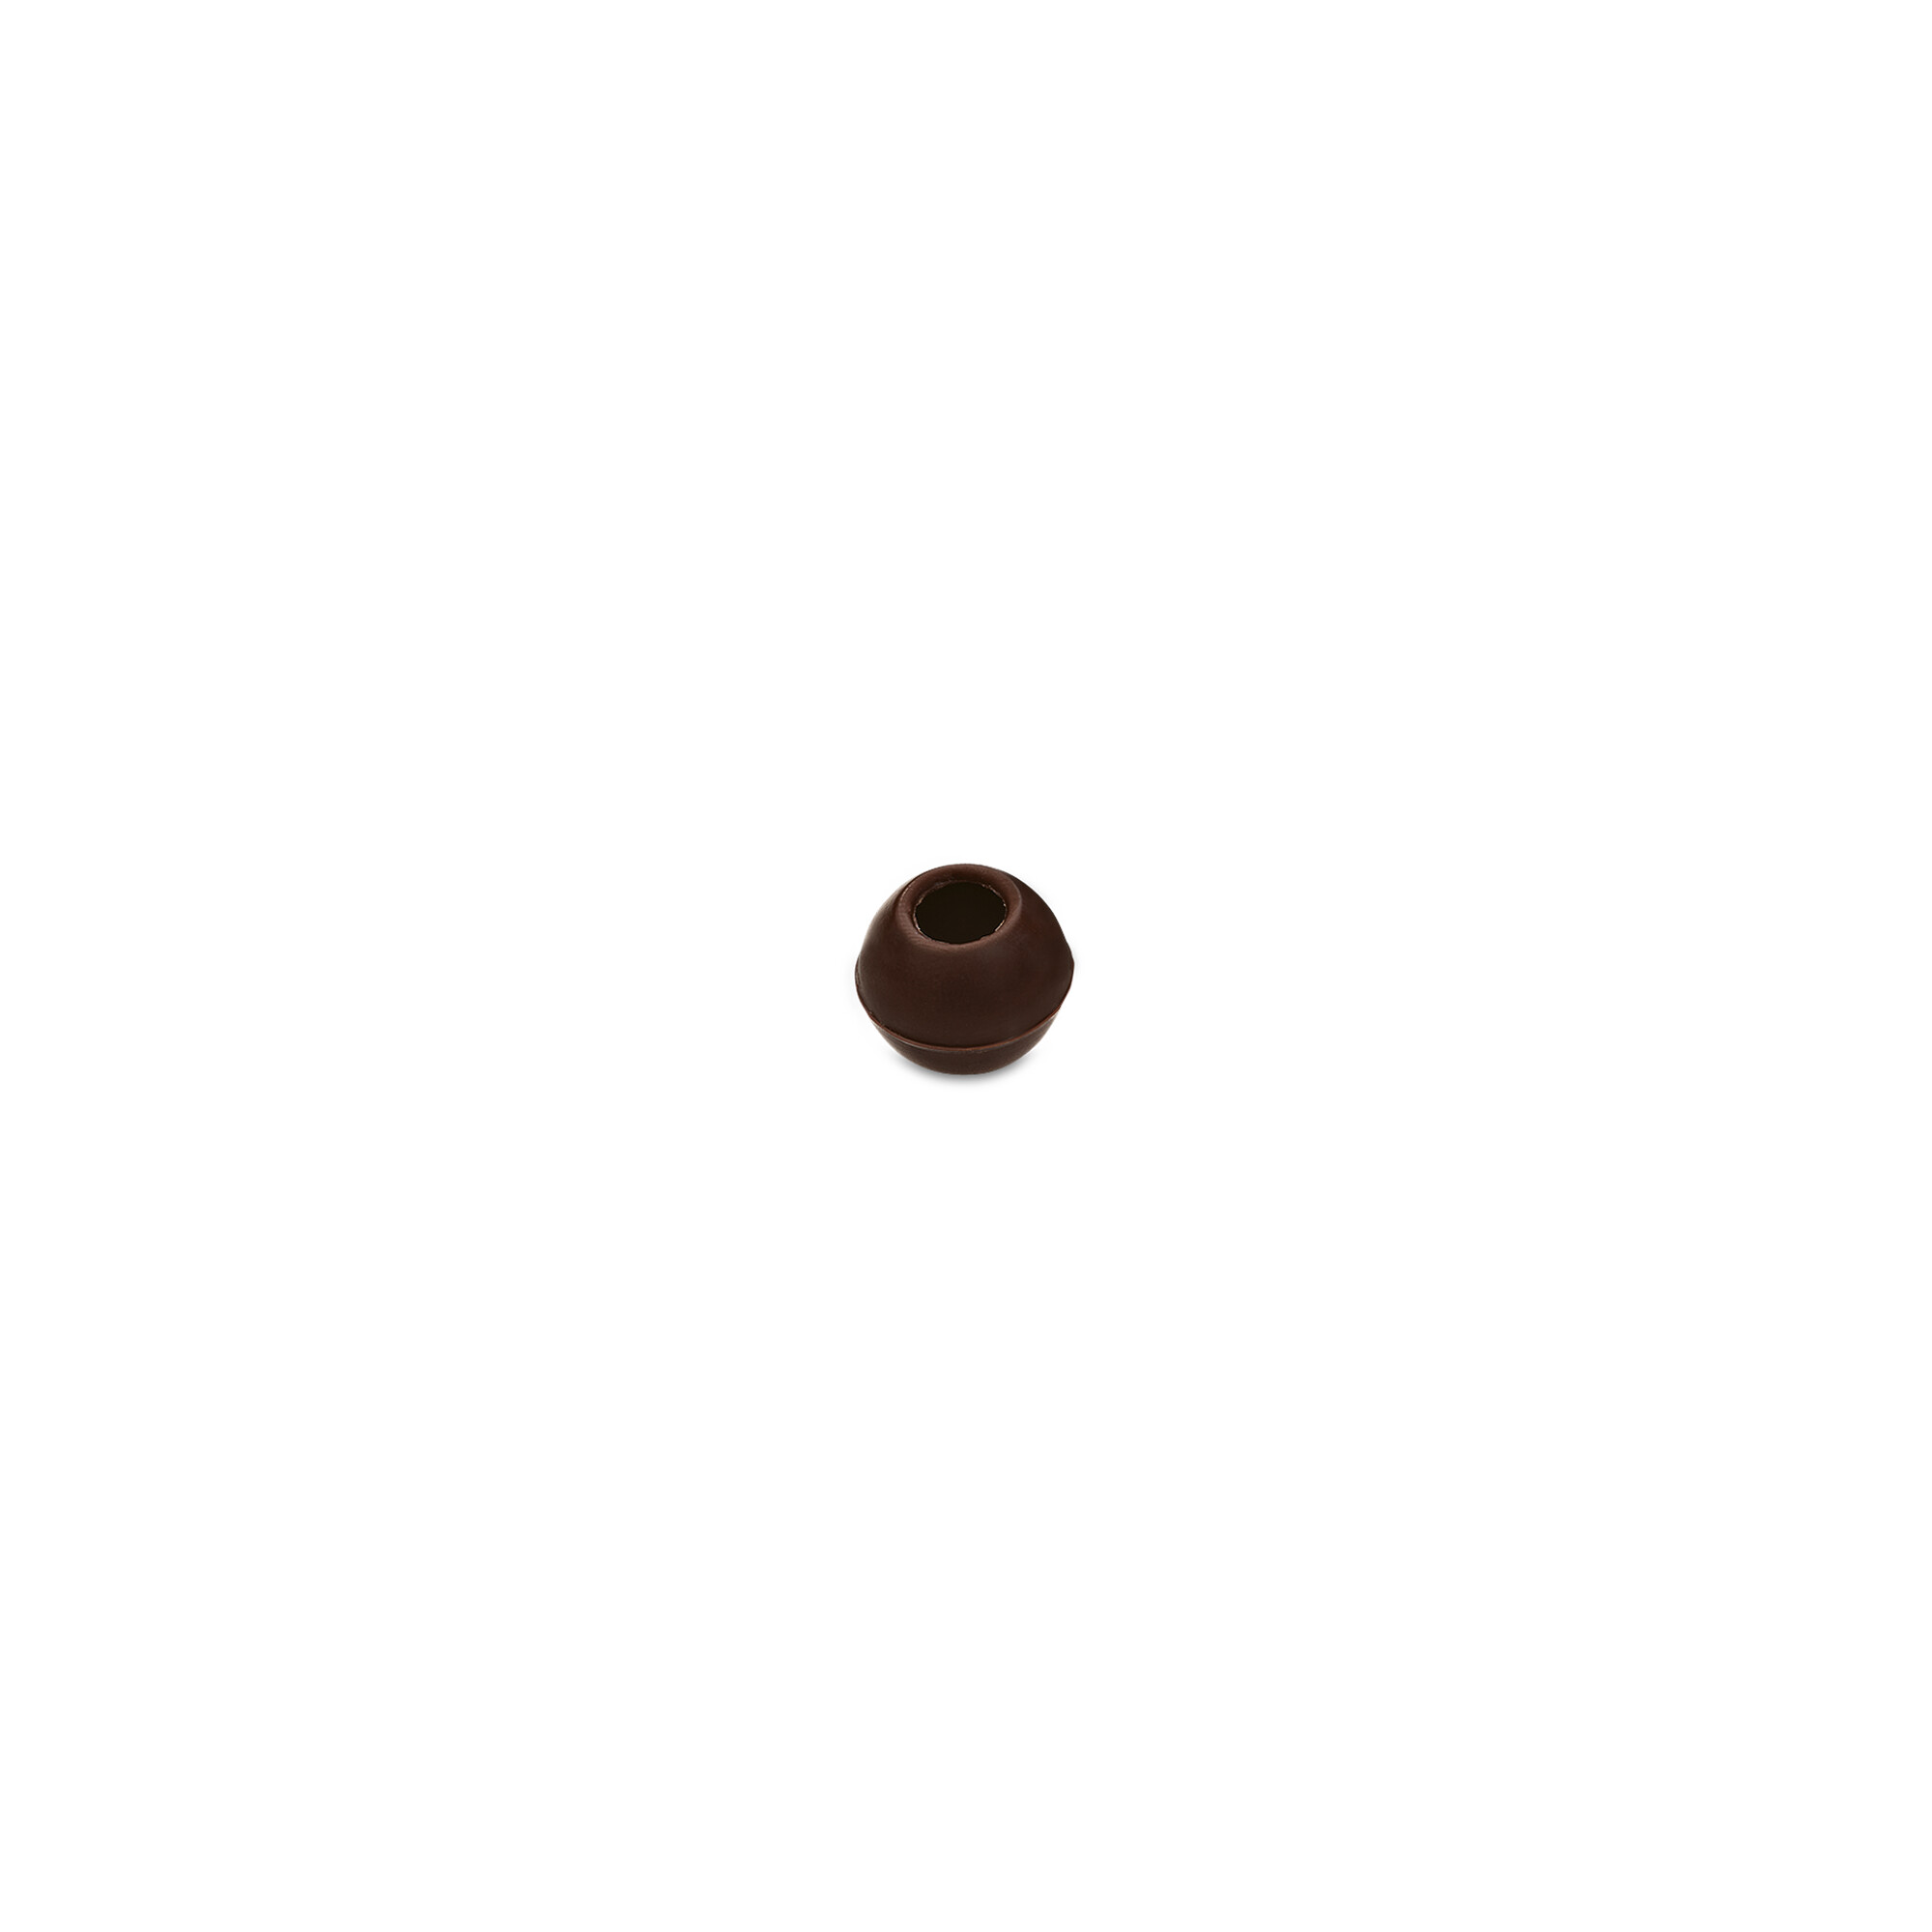 Chocolate hollow bodies - Truffes - Dark chocolate - 63 pieces